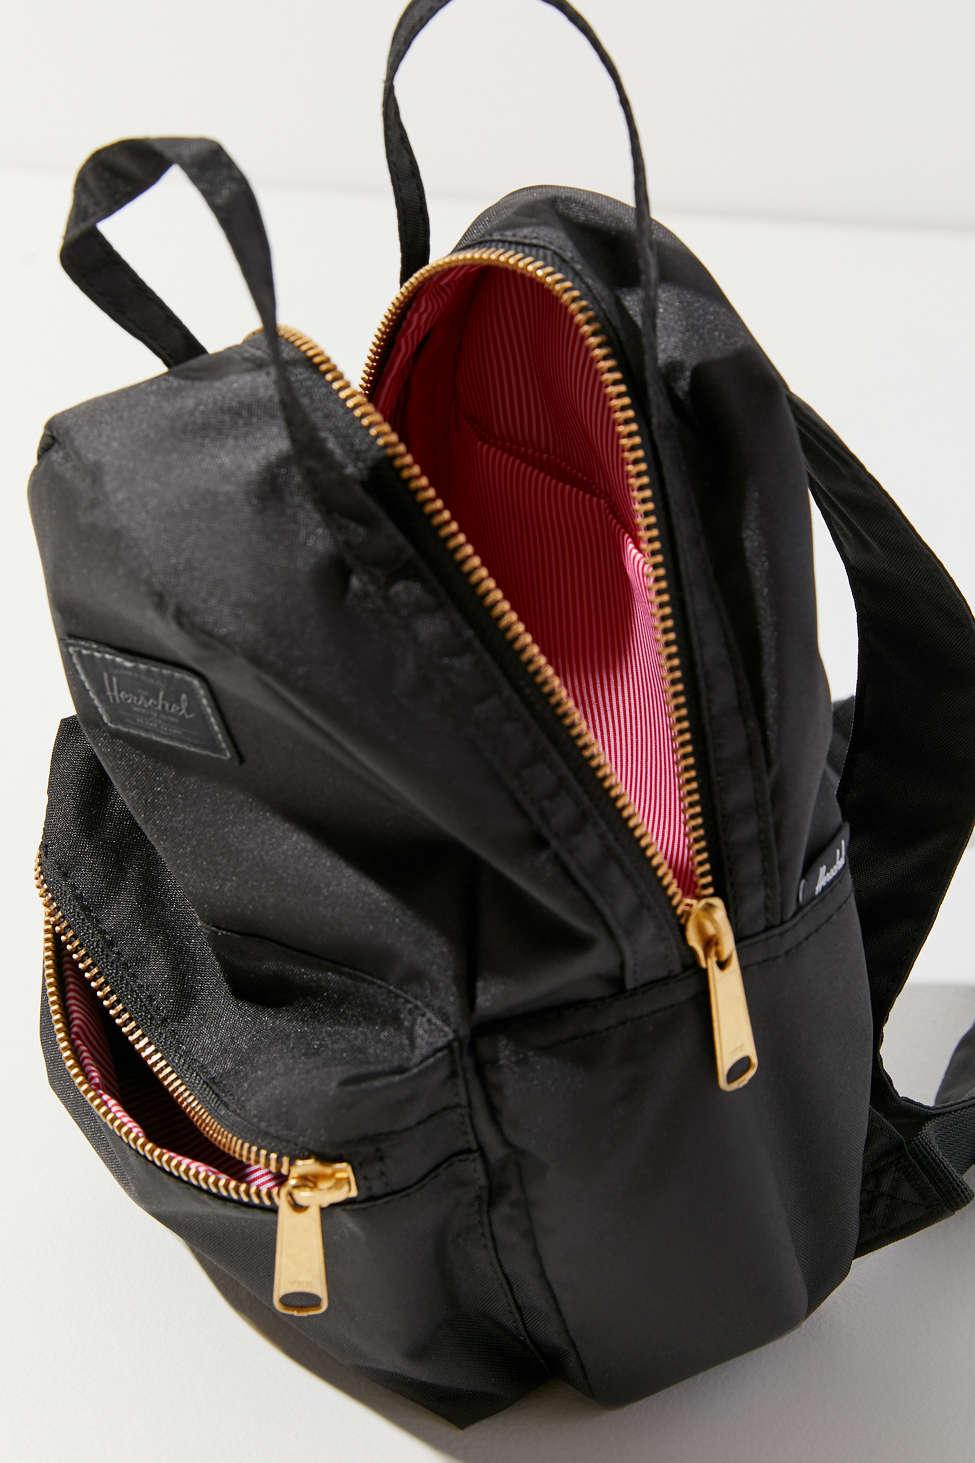 Herschel Supply Co. Nova Light Mini Backpack by Herschel Supply Co.